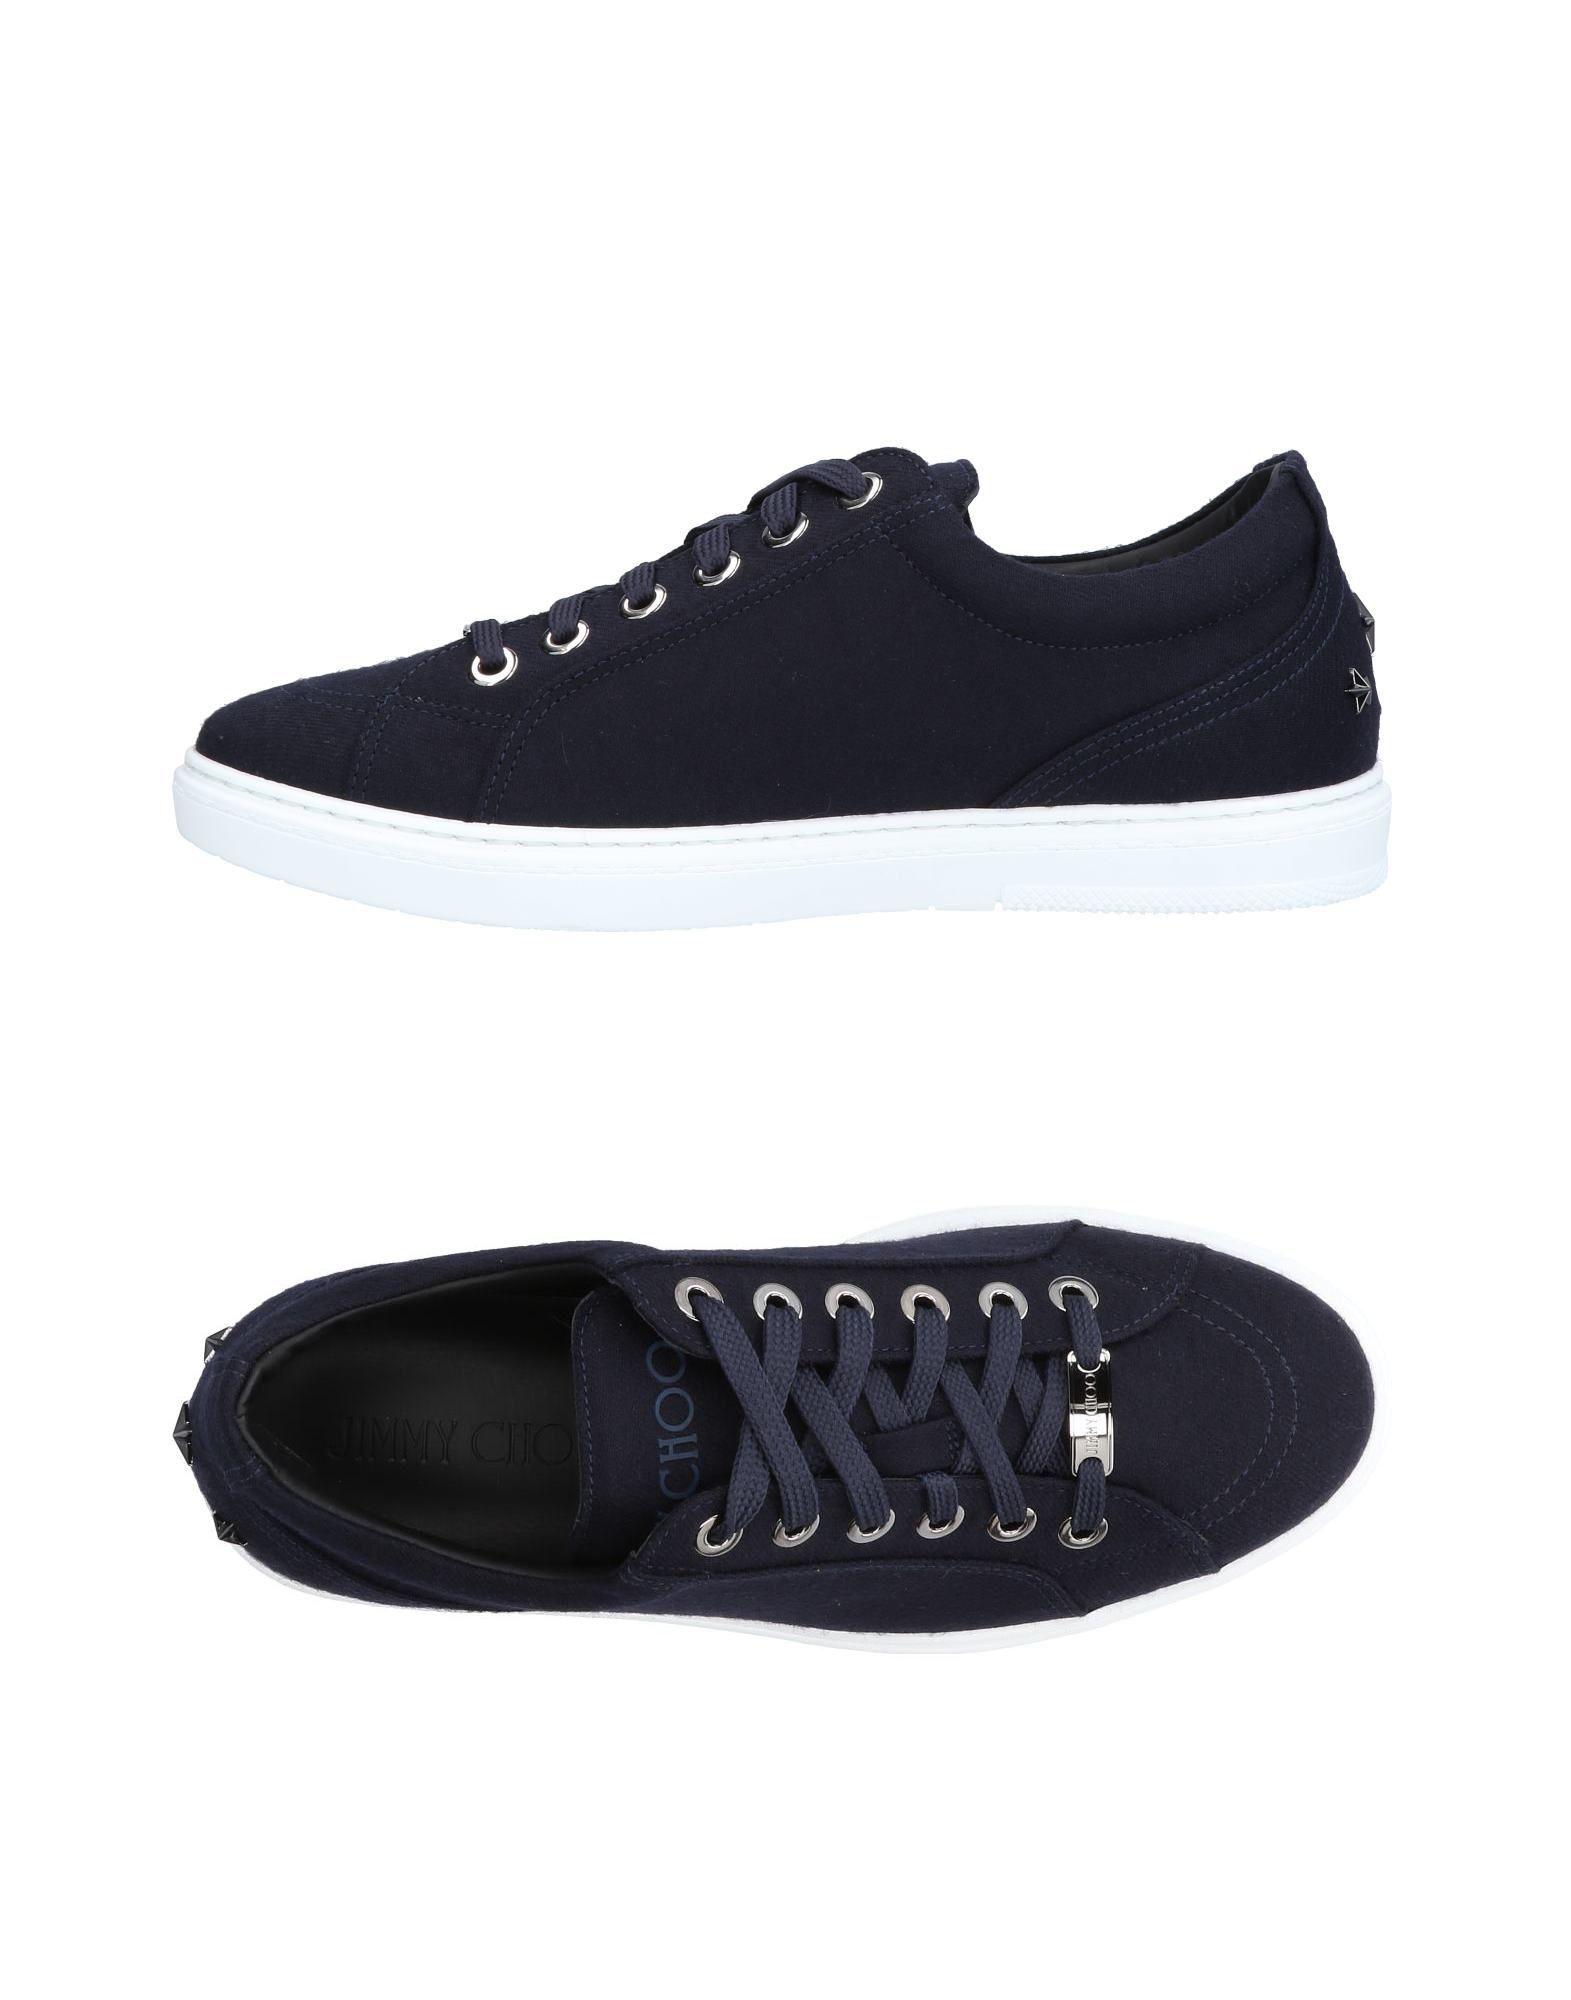 Jimmy Choo Sneakers Herren  11485876KI